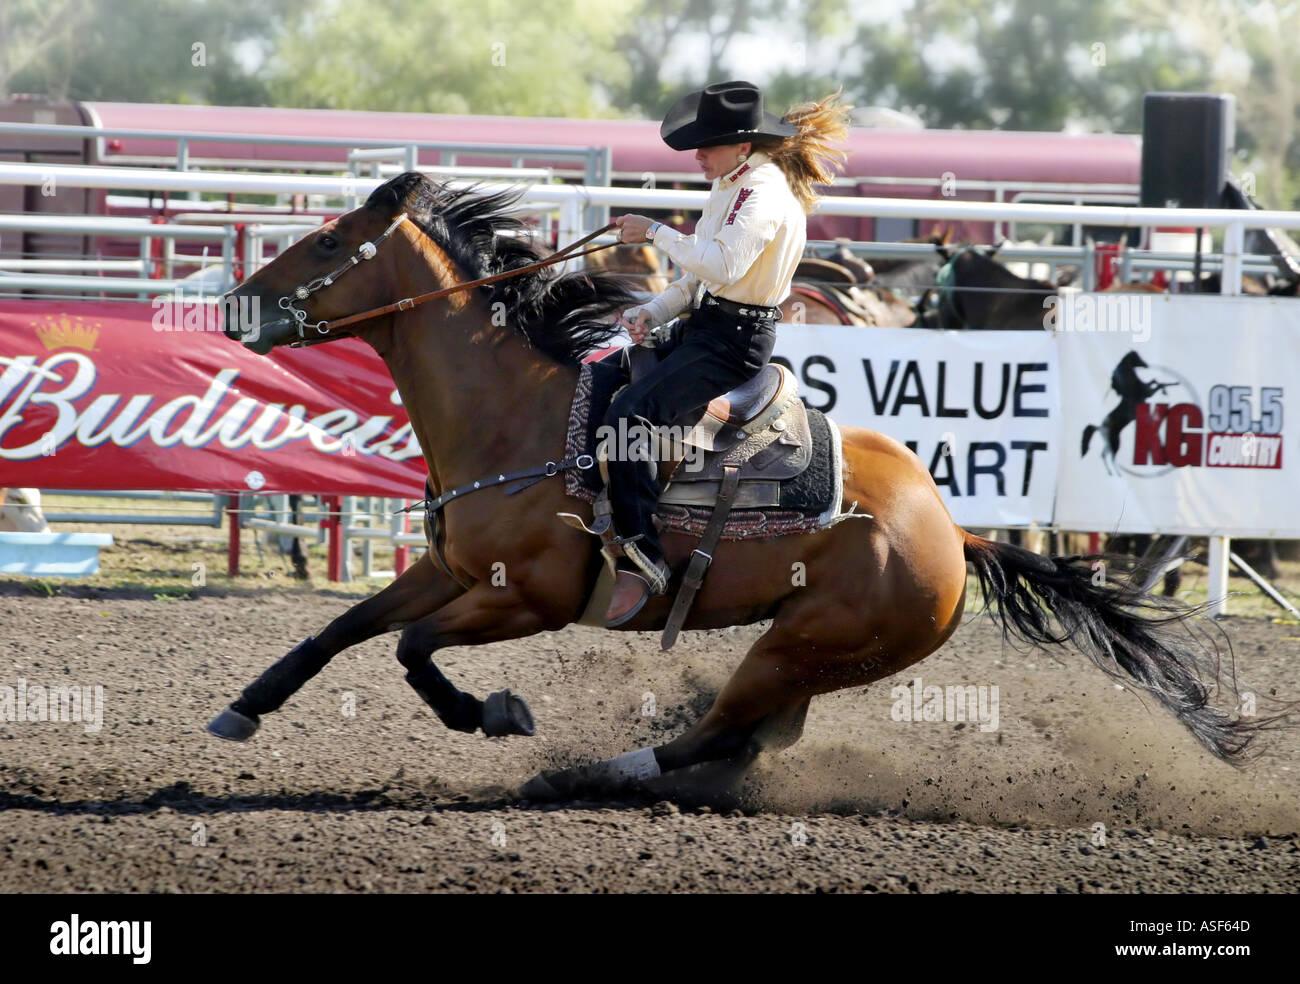 Canadian Rodeo Barrel Racer - Stock Image